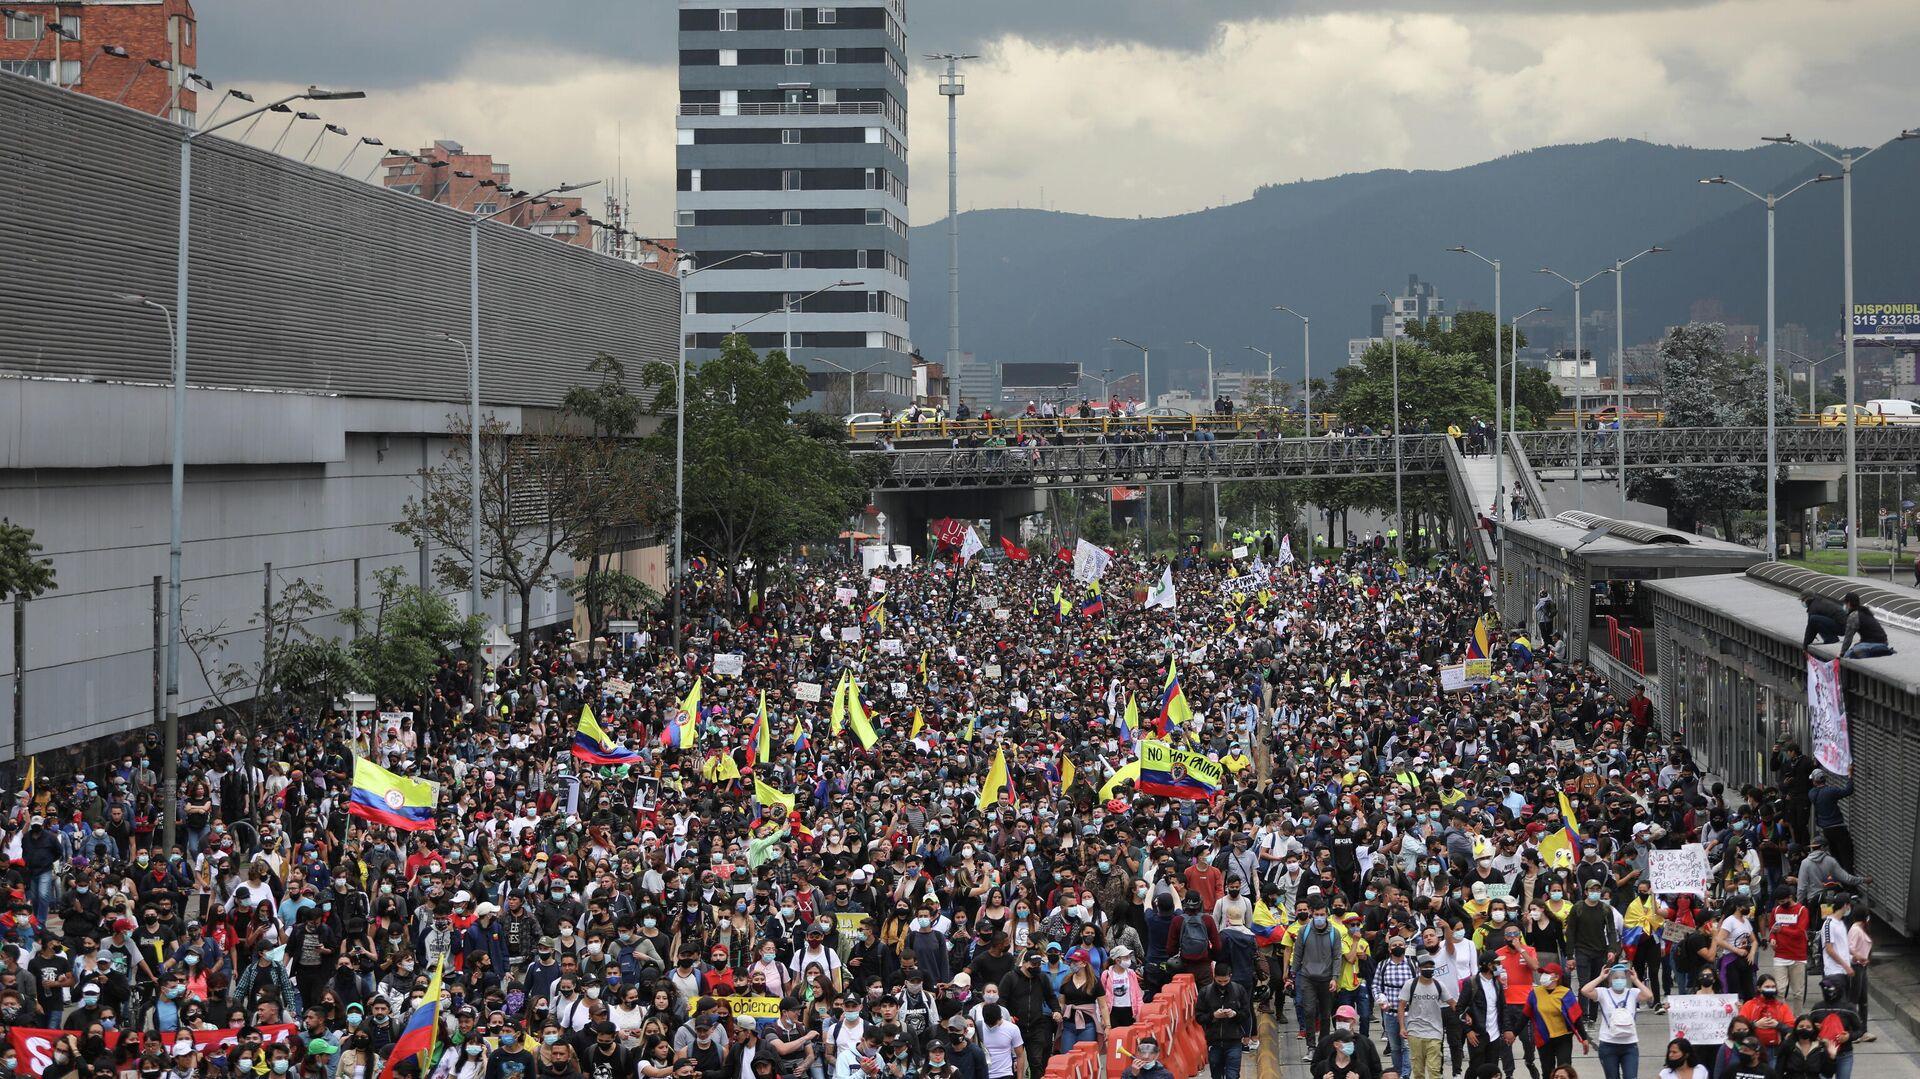 Protest en Colombia - Sputnik Mundo, 1920, 28.04.2021